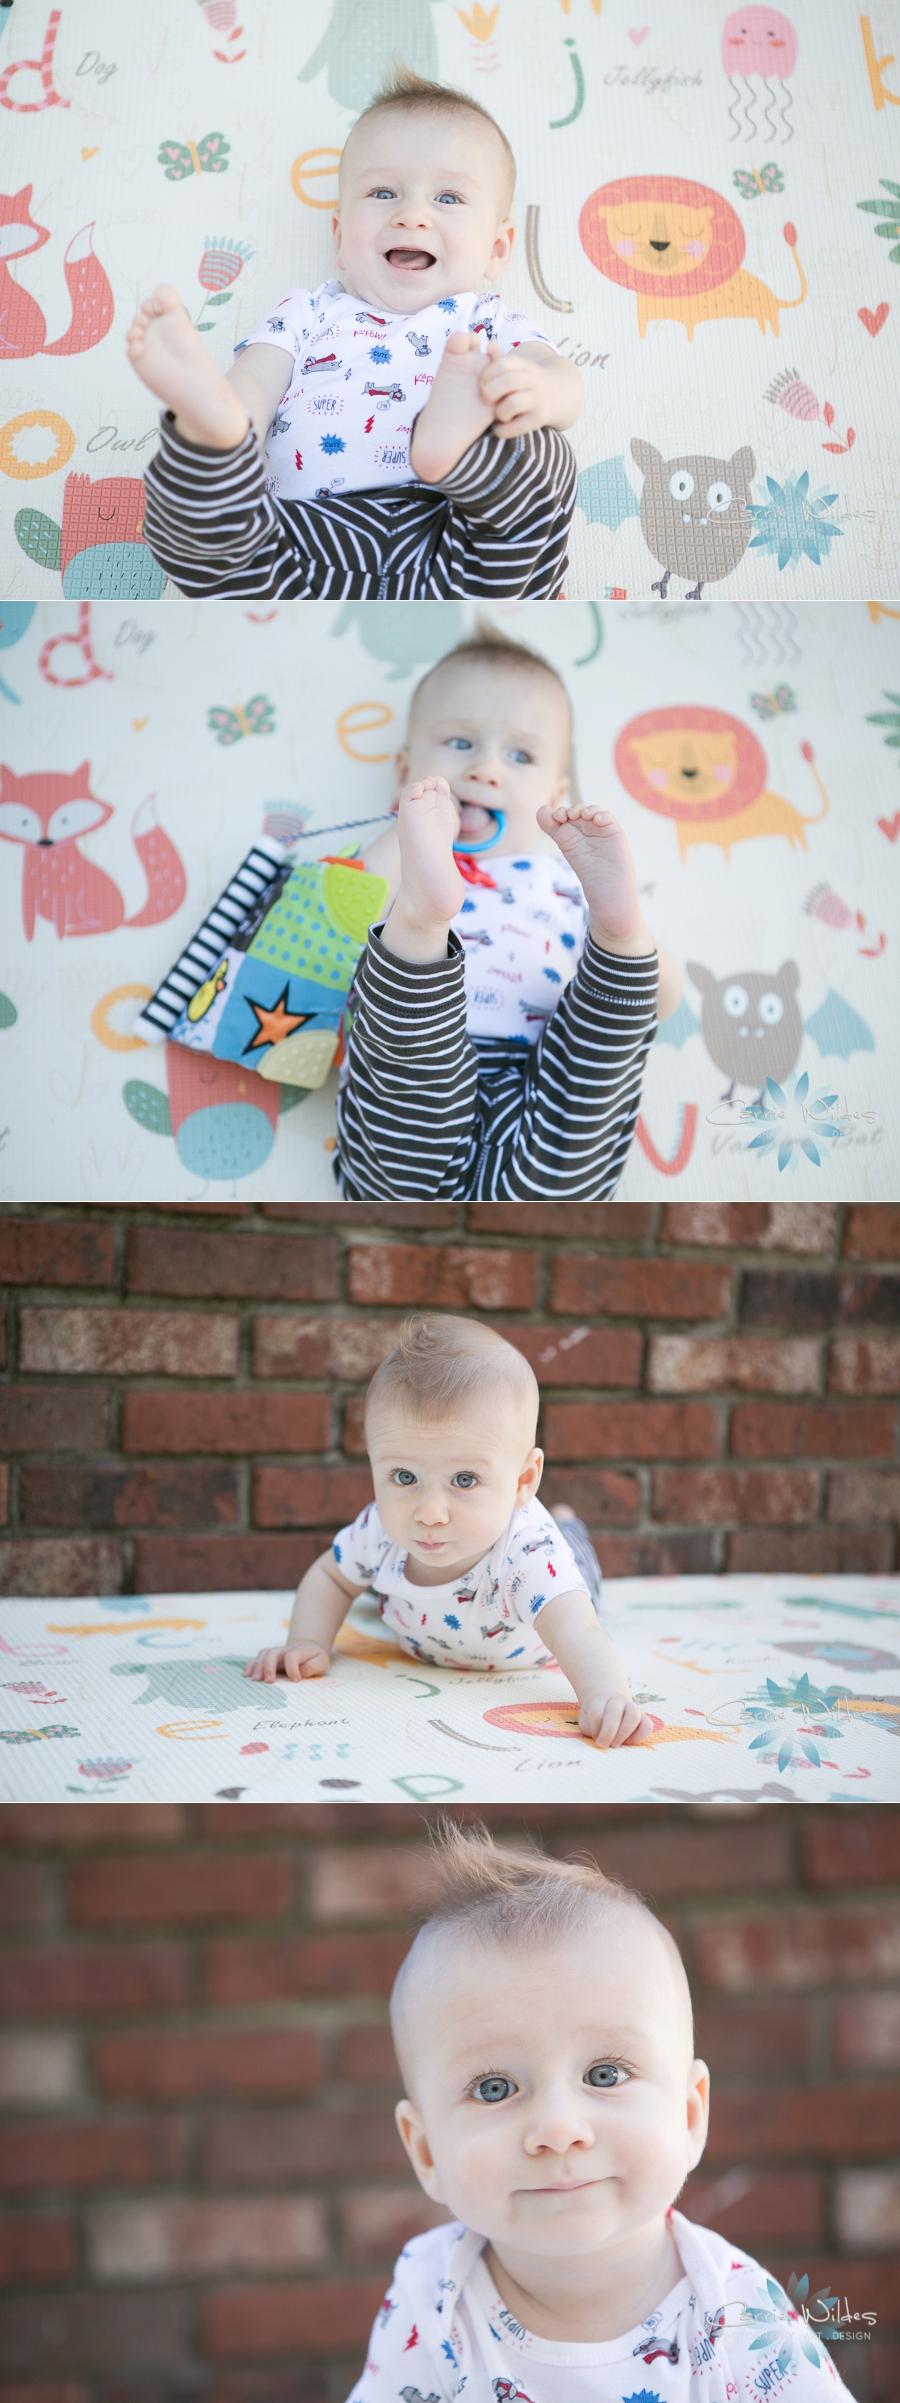 1_7_19 Landon Tampa Baby Portraits_0008.jpg